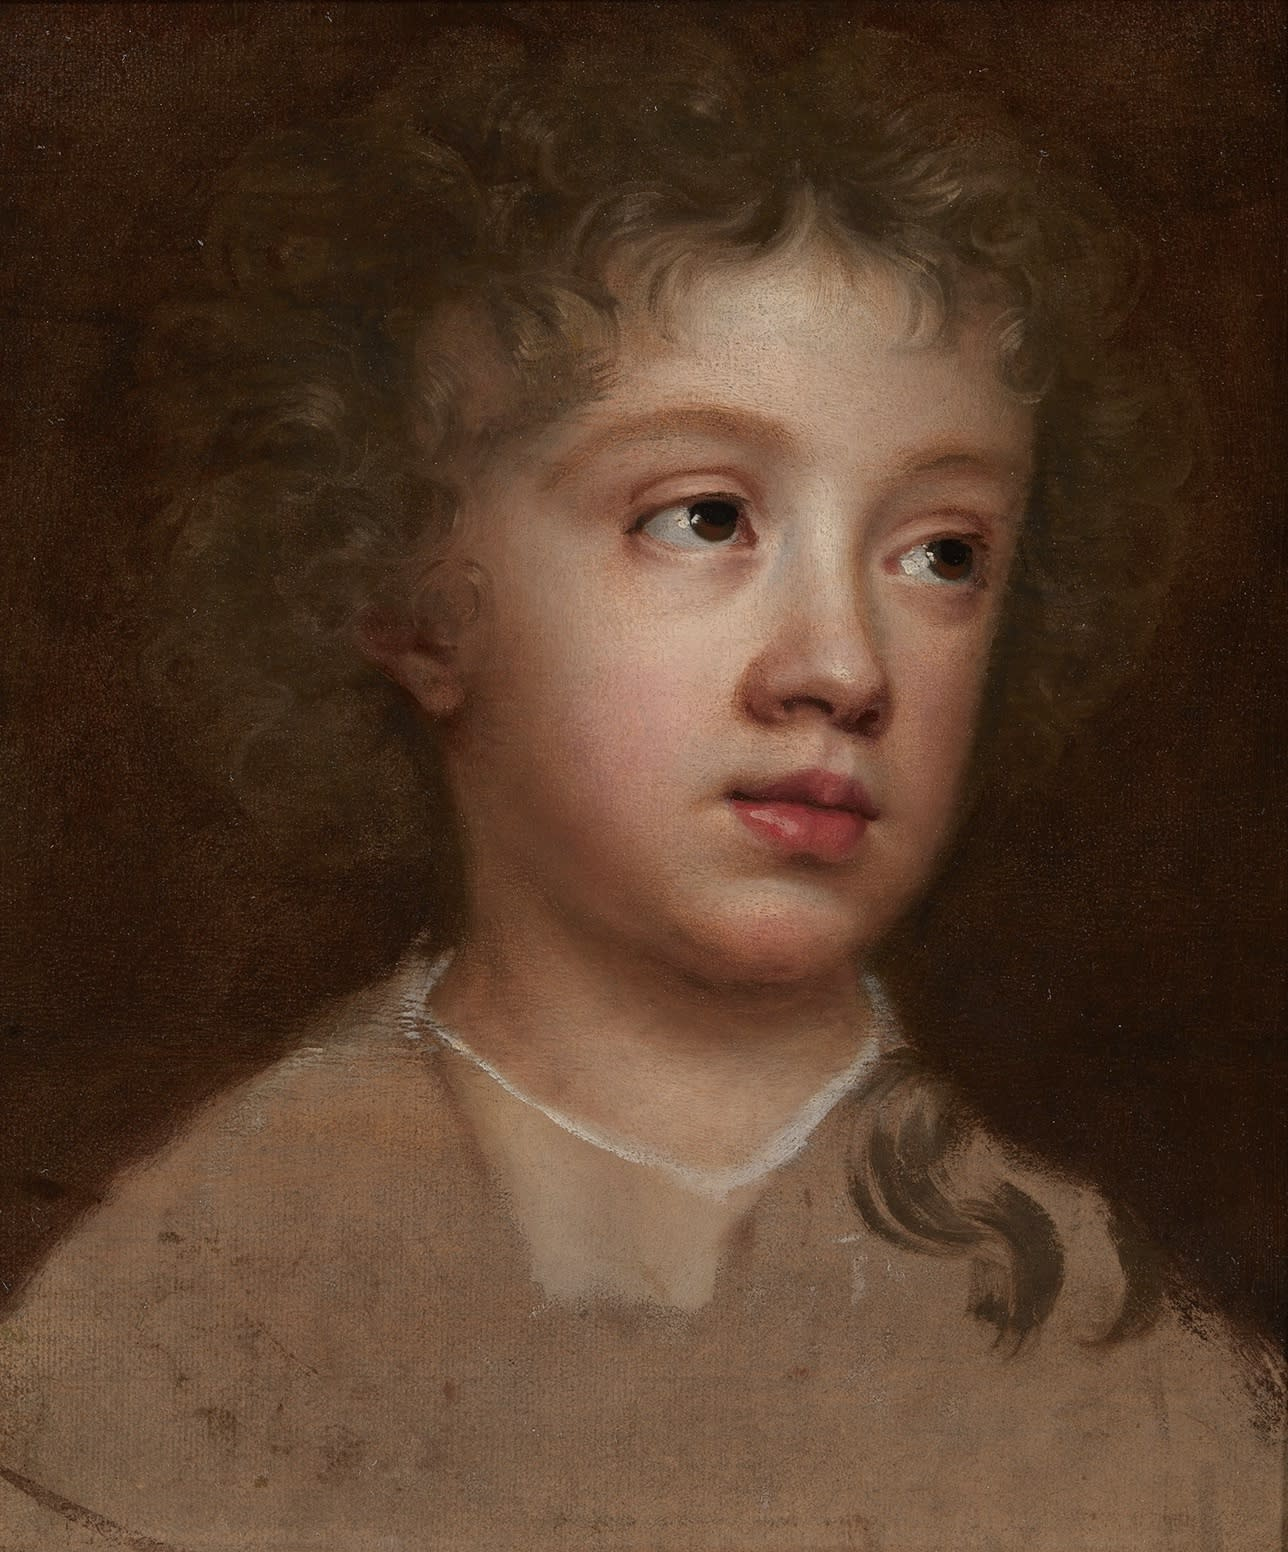 Portrait of Bartholomew, the artist's son